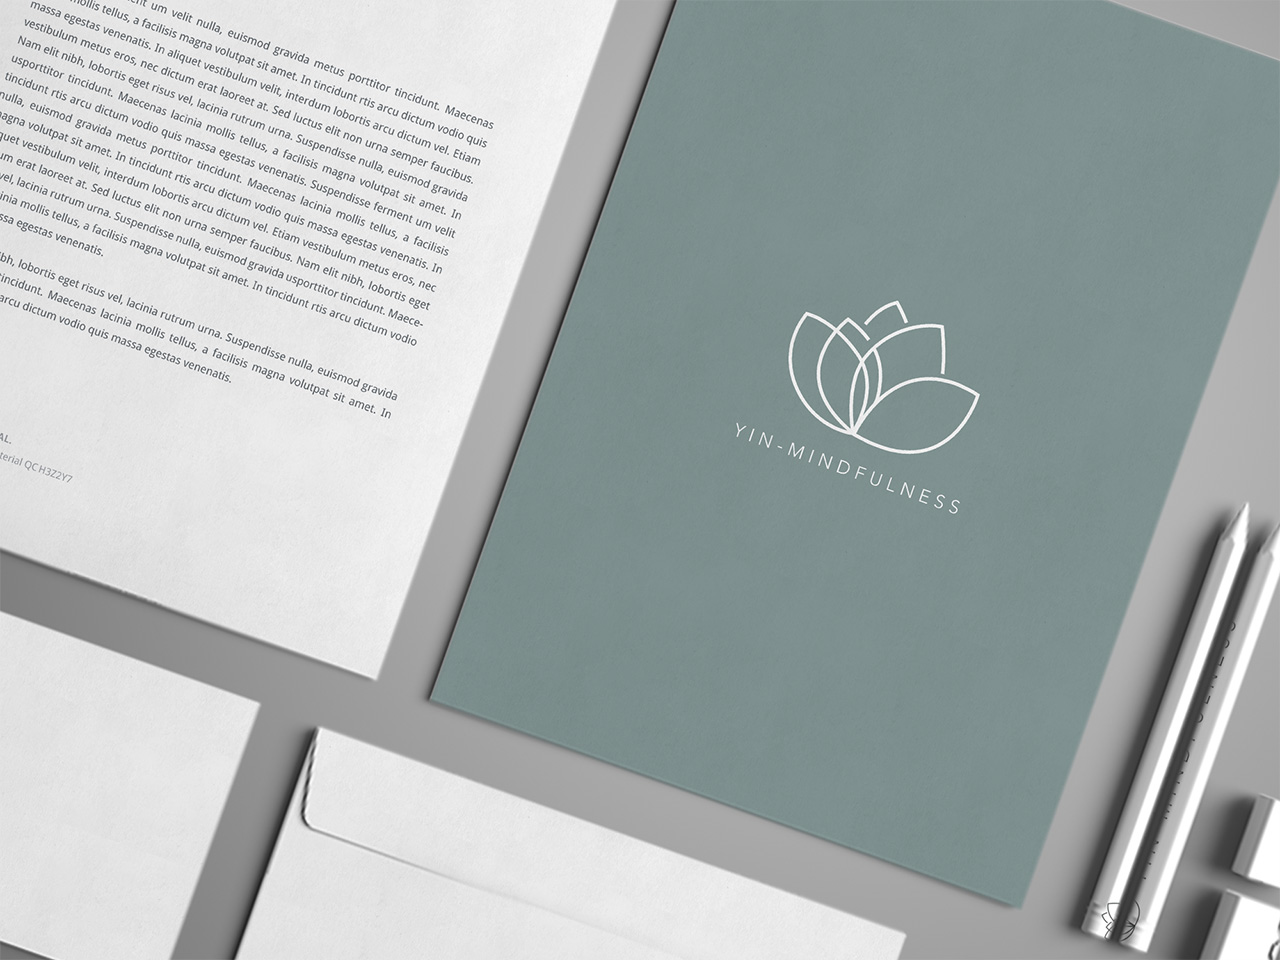 Web Design Portfolio - Yin Mindfulness